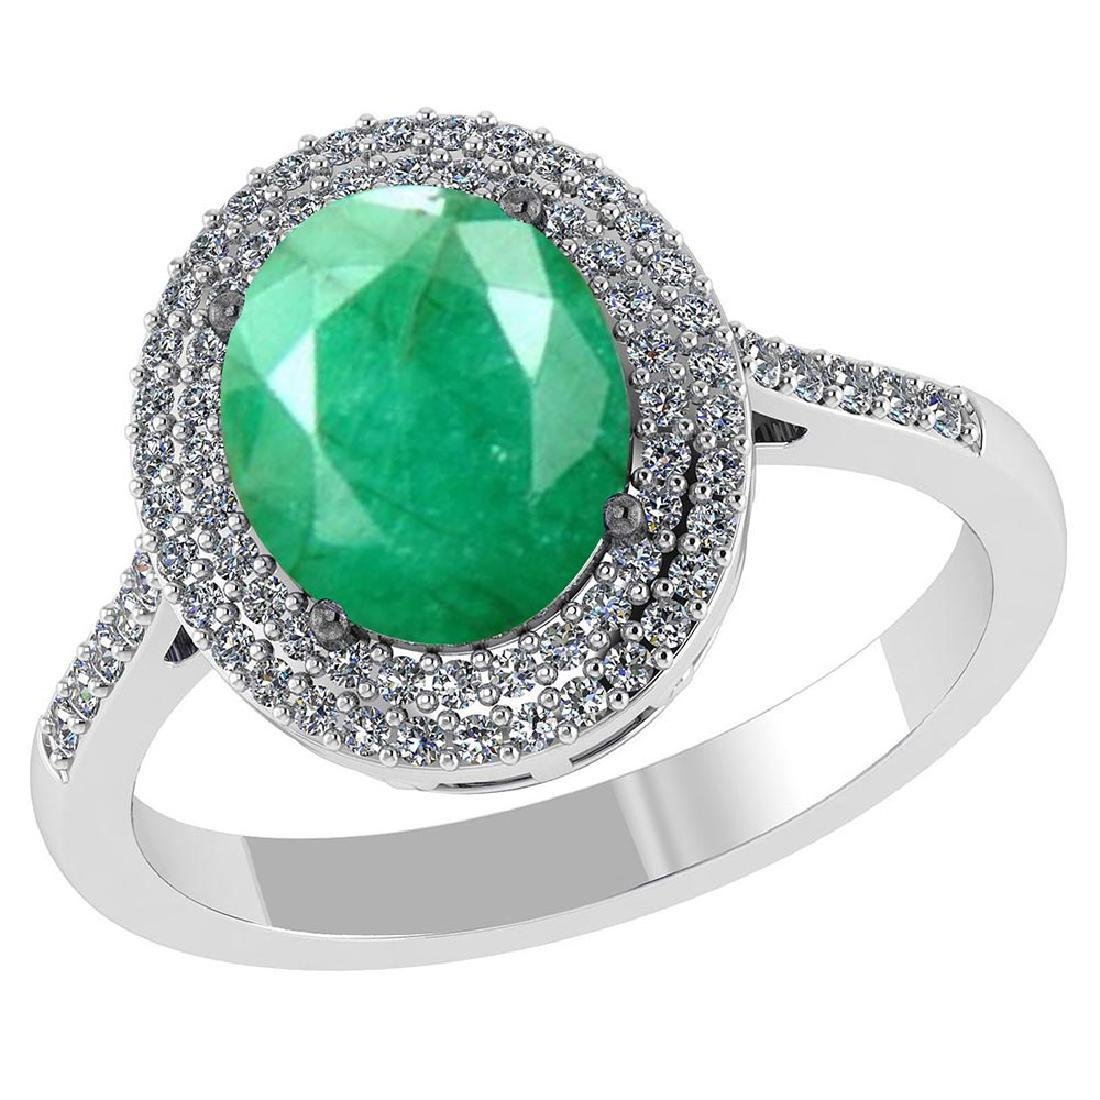 Certified 3.2 CTW Genuine Emerald And Diamond 14K White